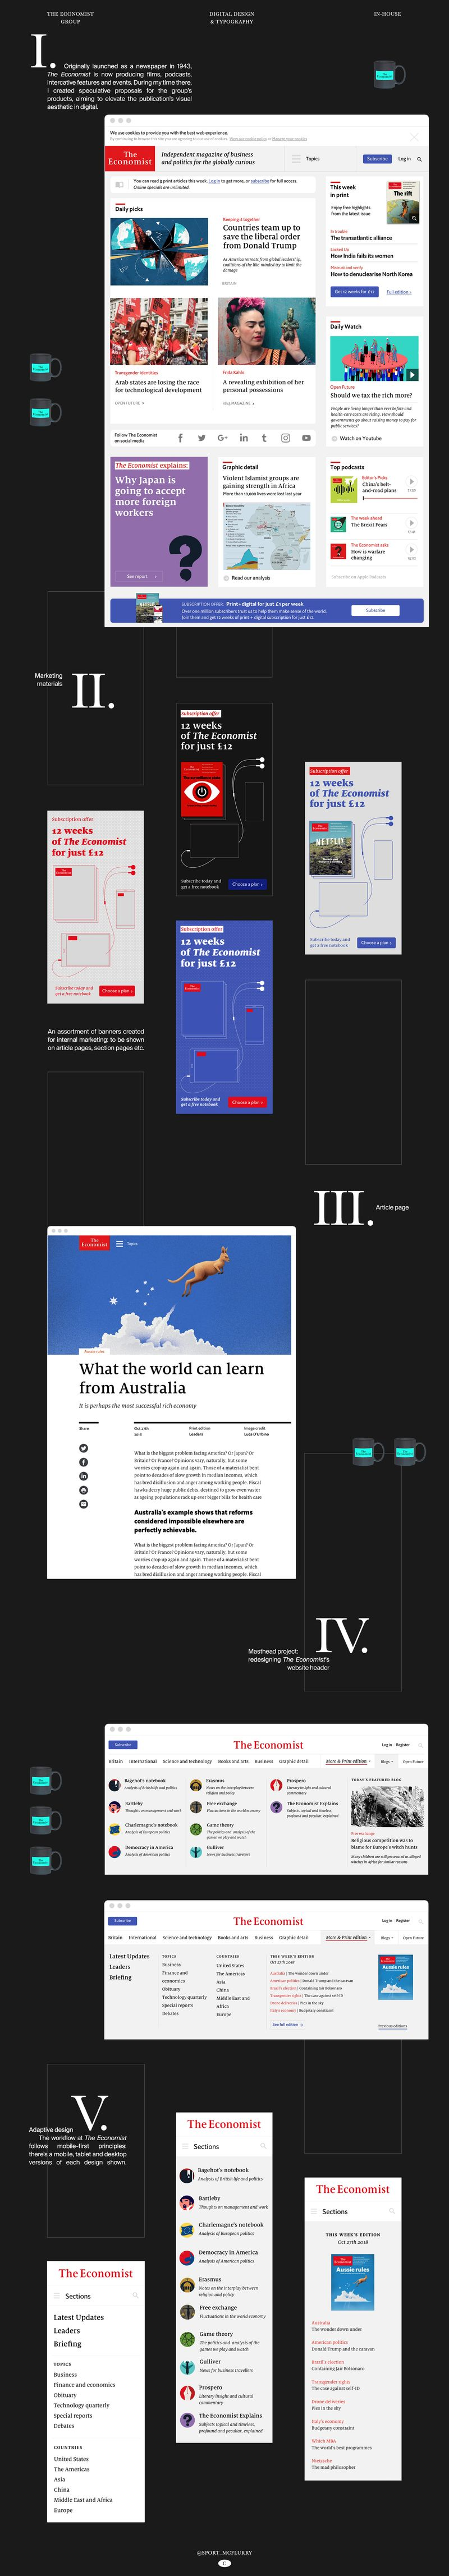 The Economist digital UI